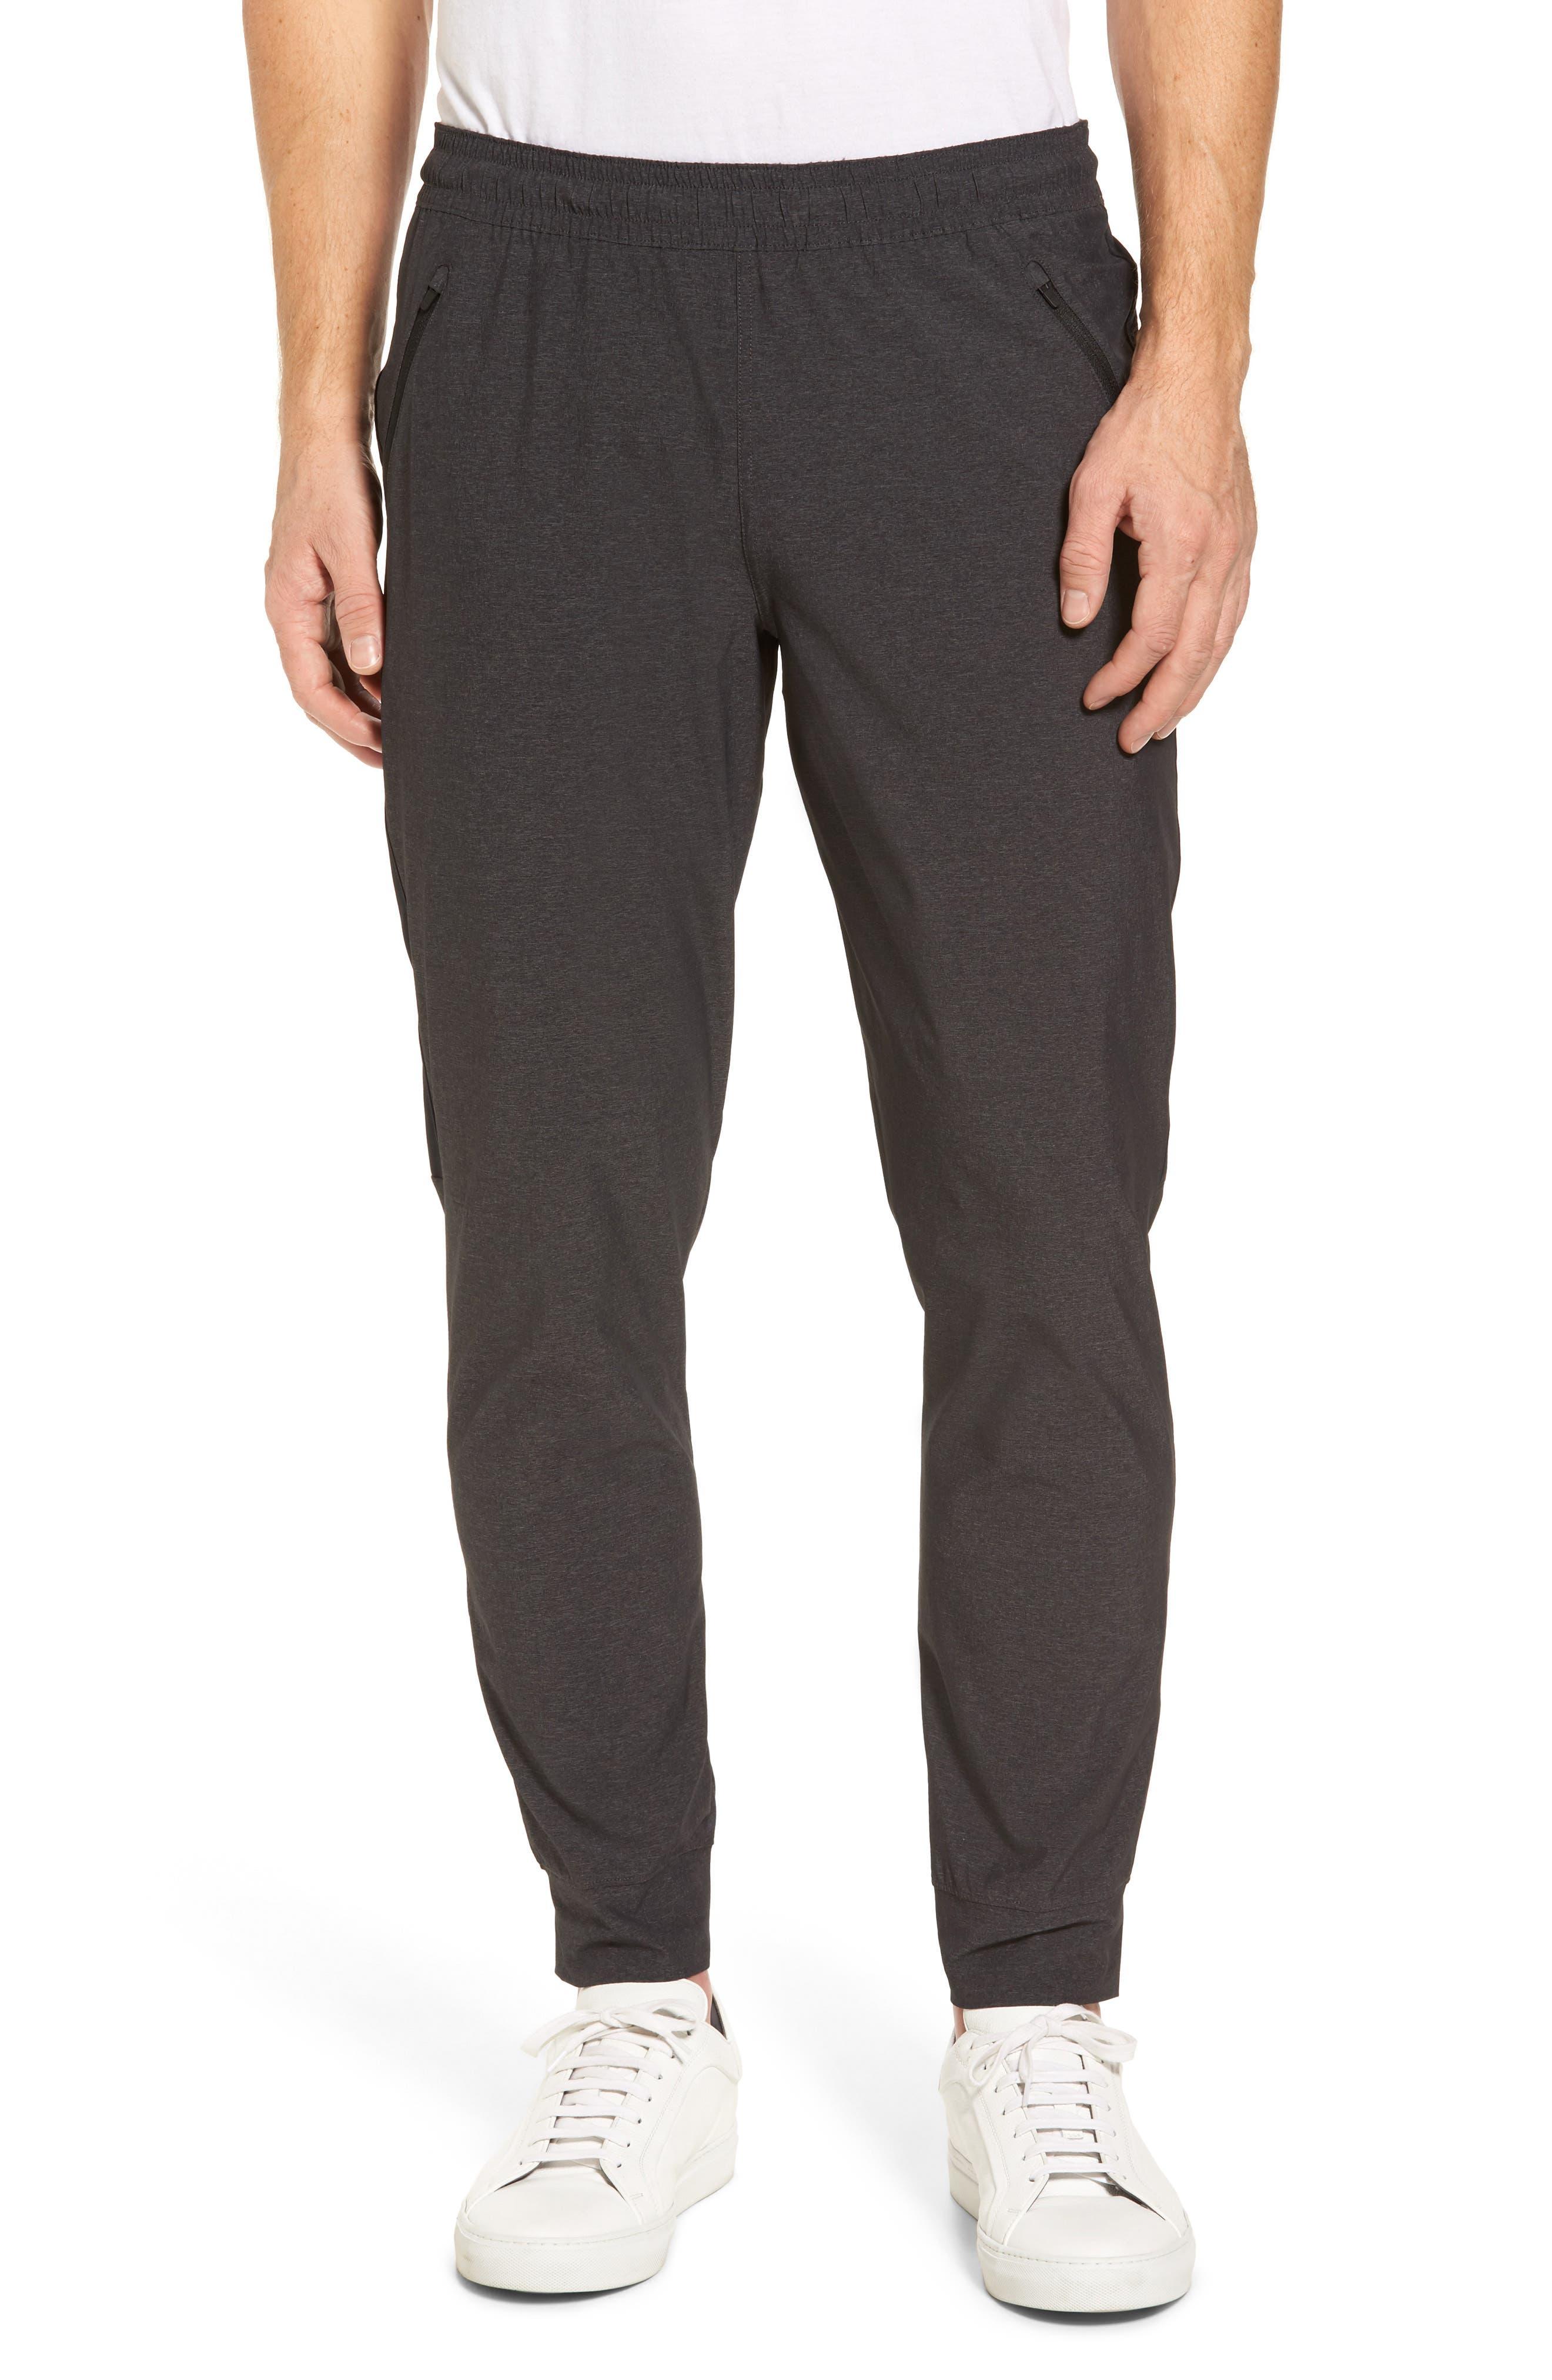 Zip Pocket Sweatpants,                             Main thumbnail 1, color,                             Grey Ebony Melange